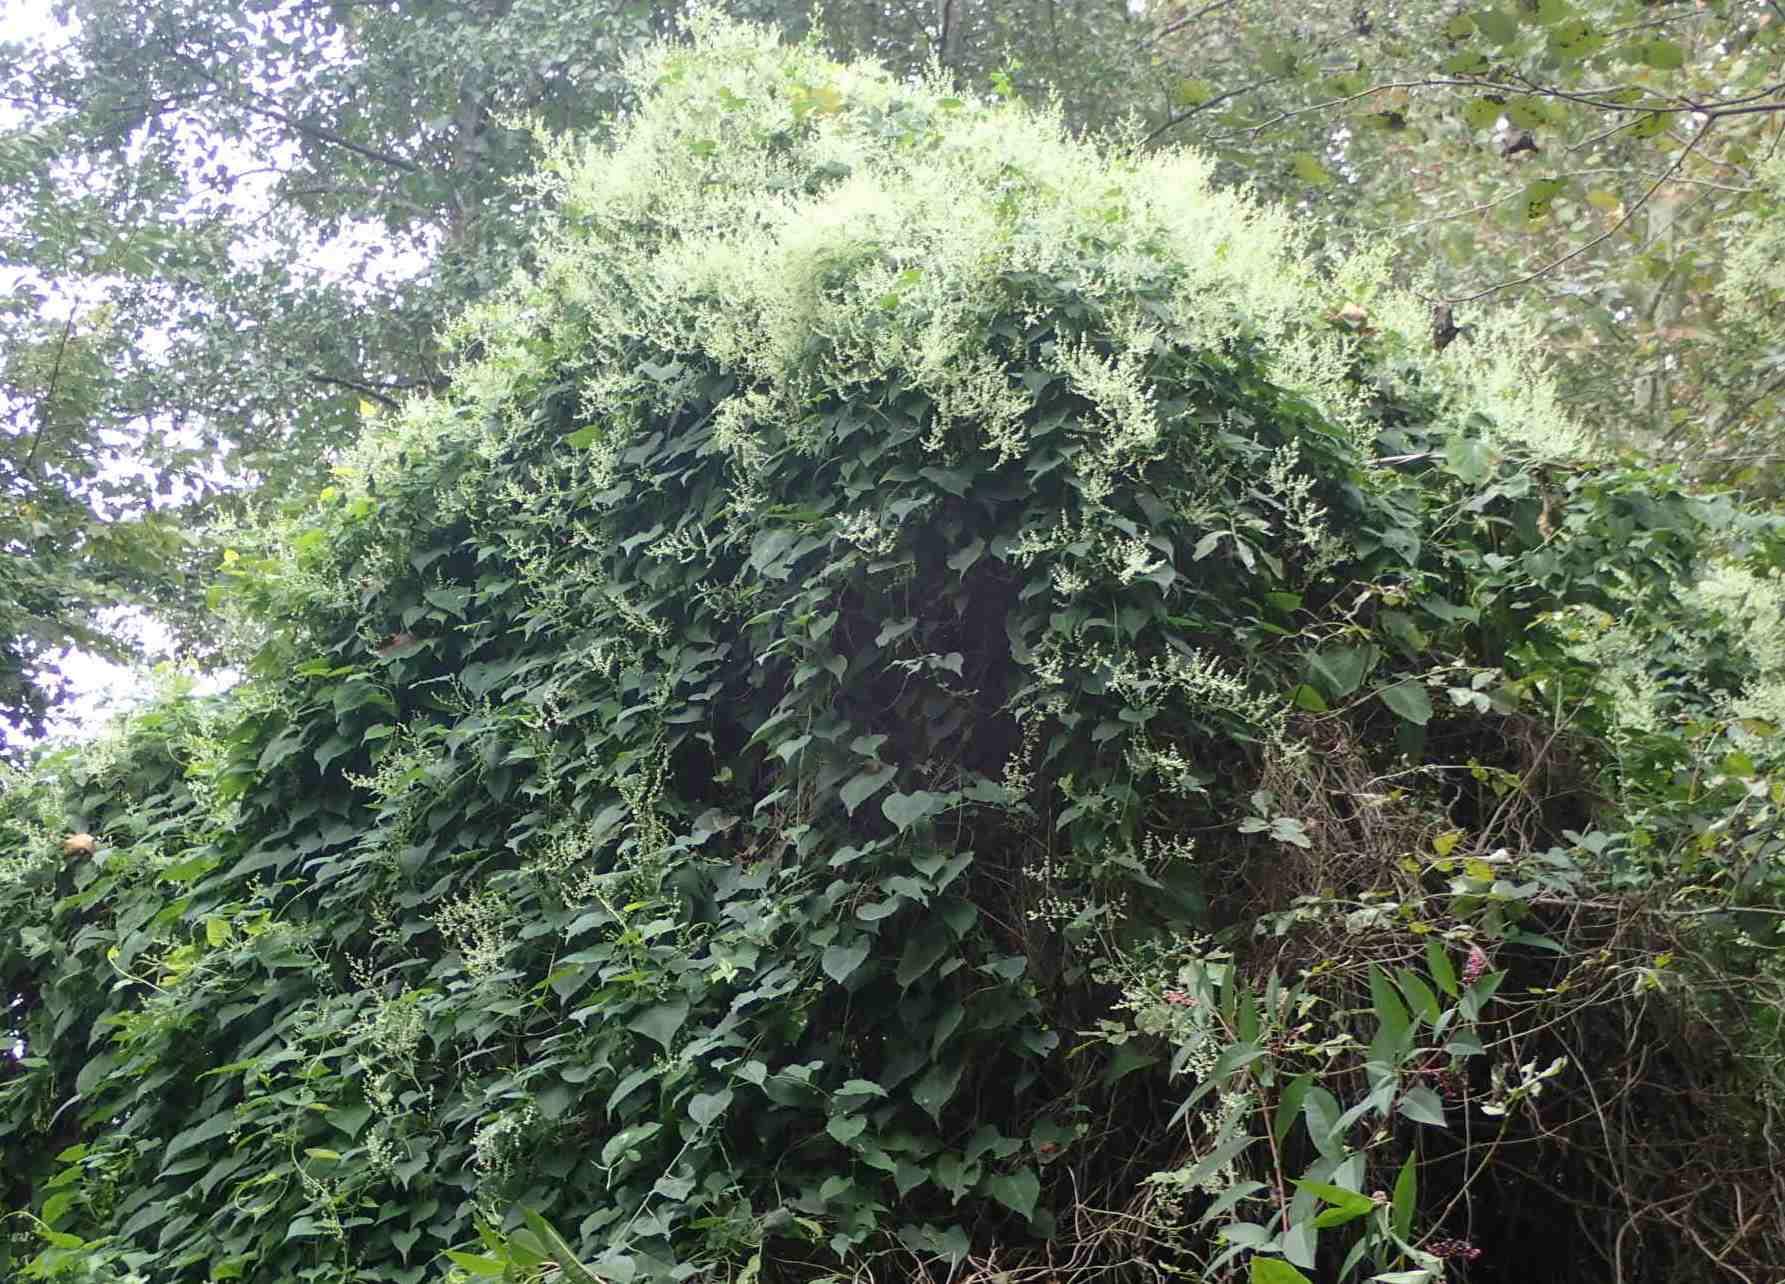 Rampicanti invasivi:  diverse specie di Fallopia sp. (Polygonaceae)